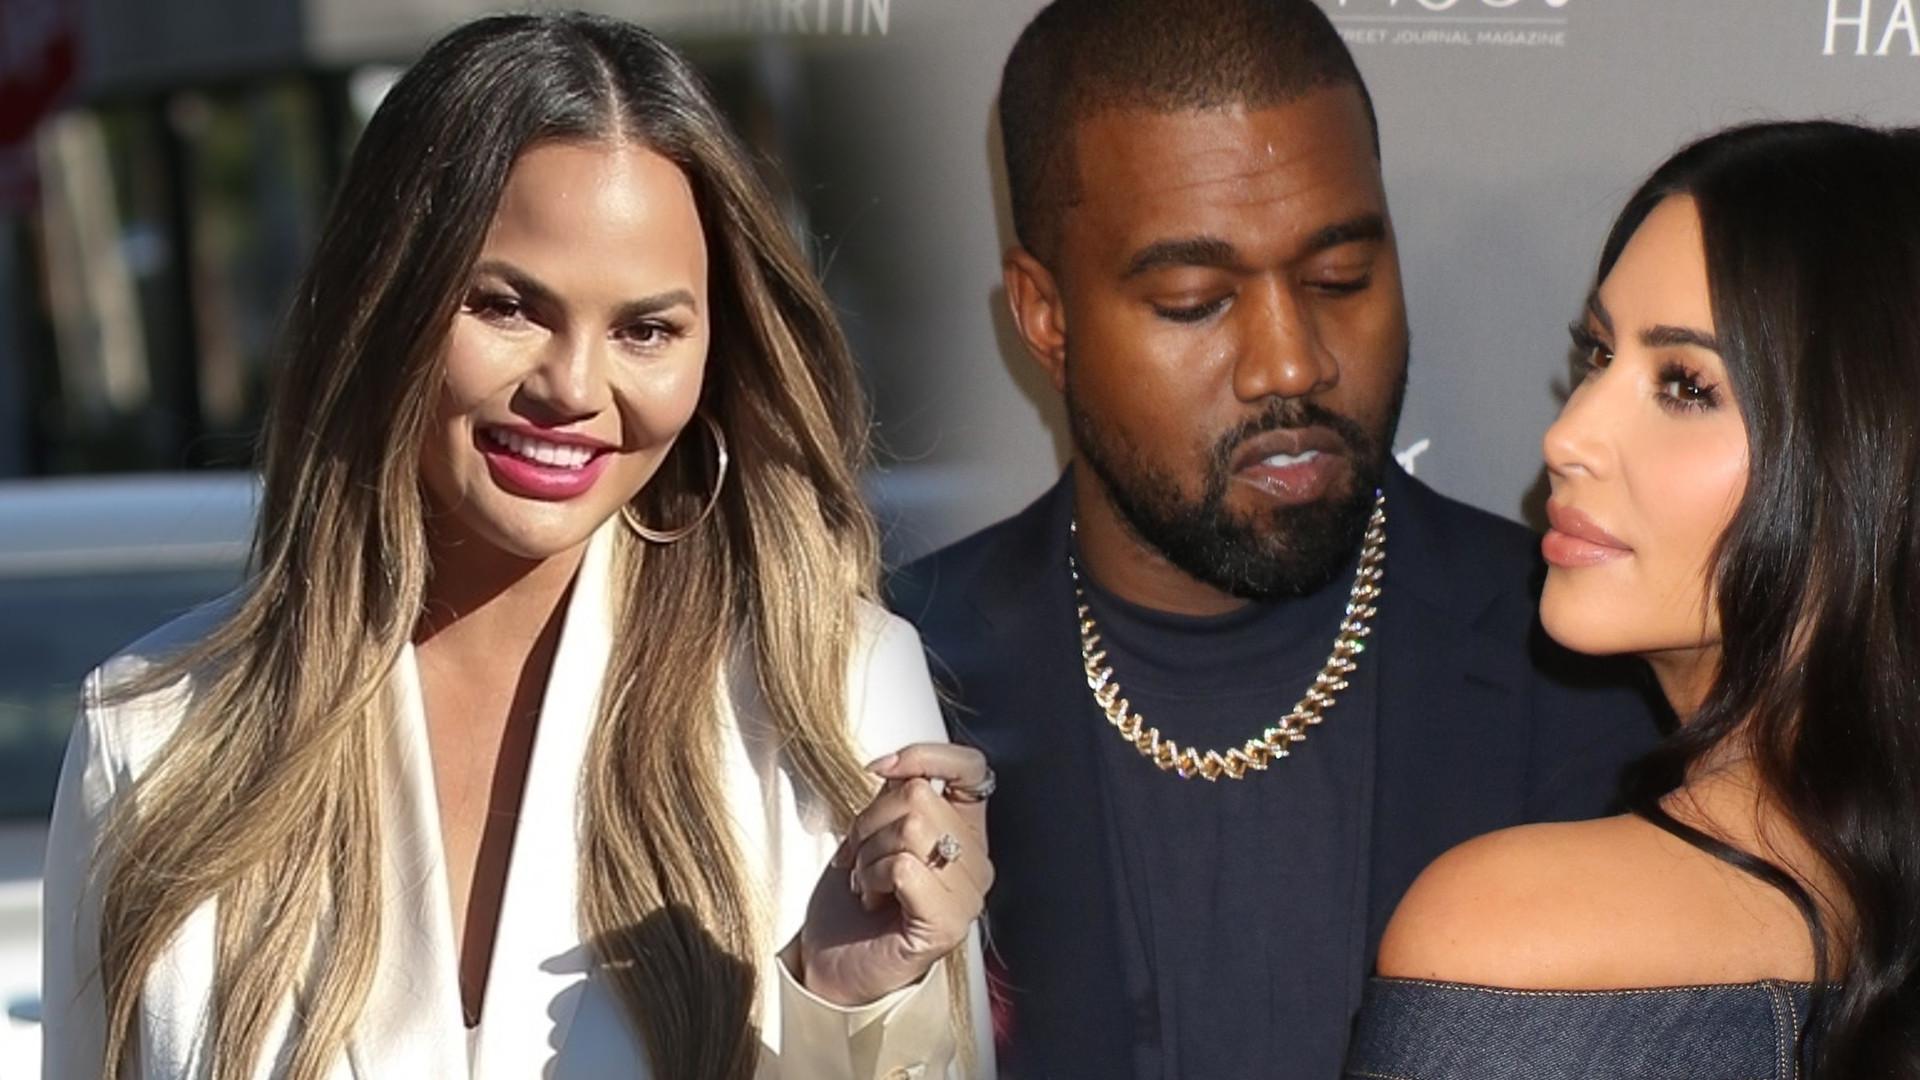 Chrissy Teigen ujawnia KULISY rozwodu Kim Kardashian i Kanye Westa!